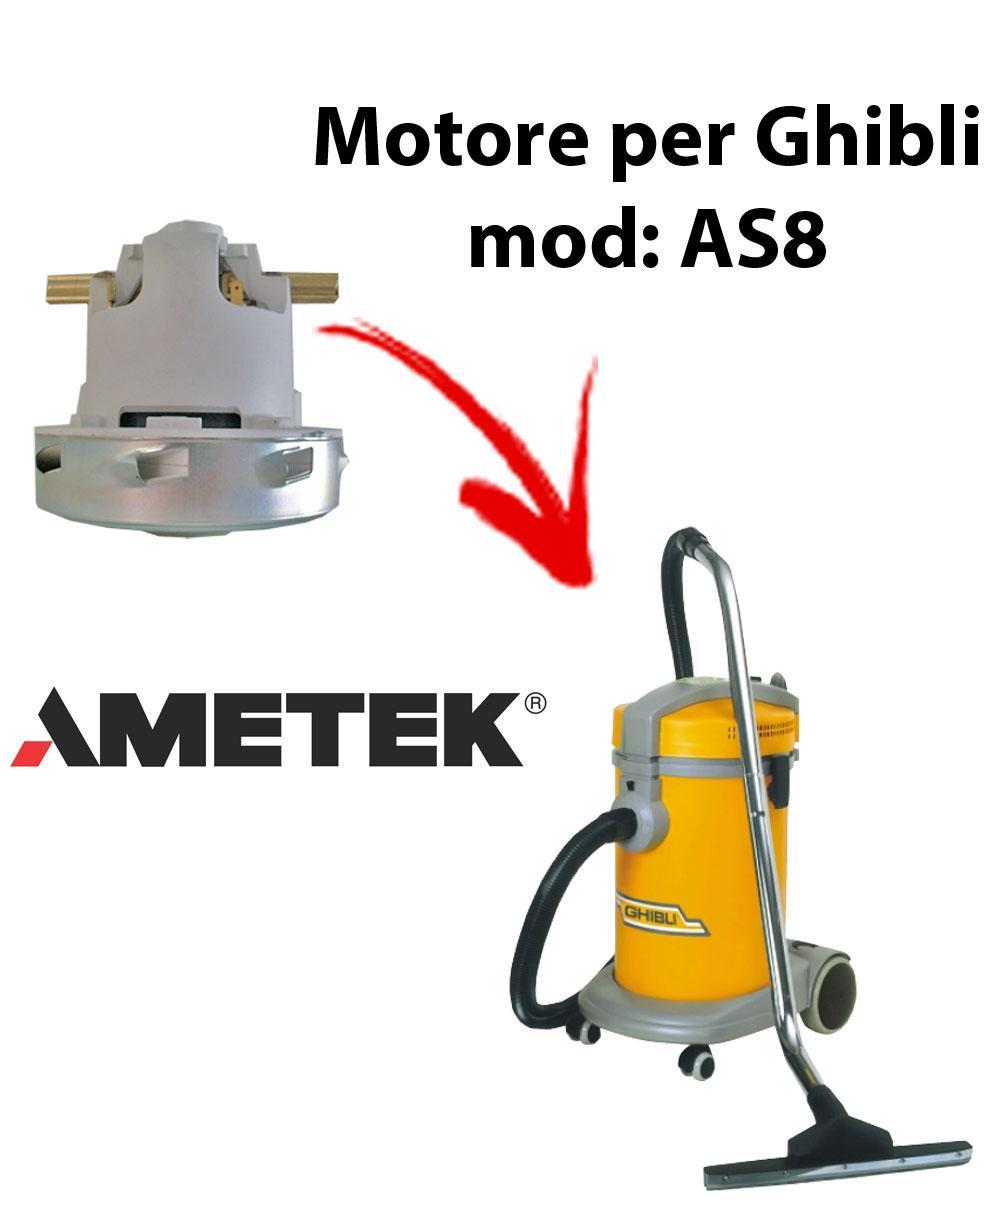 Motore Ametek di aspirazione per Aspirapolvere GHIBLI, modello AS8